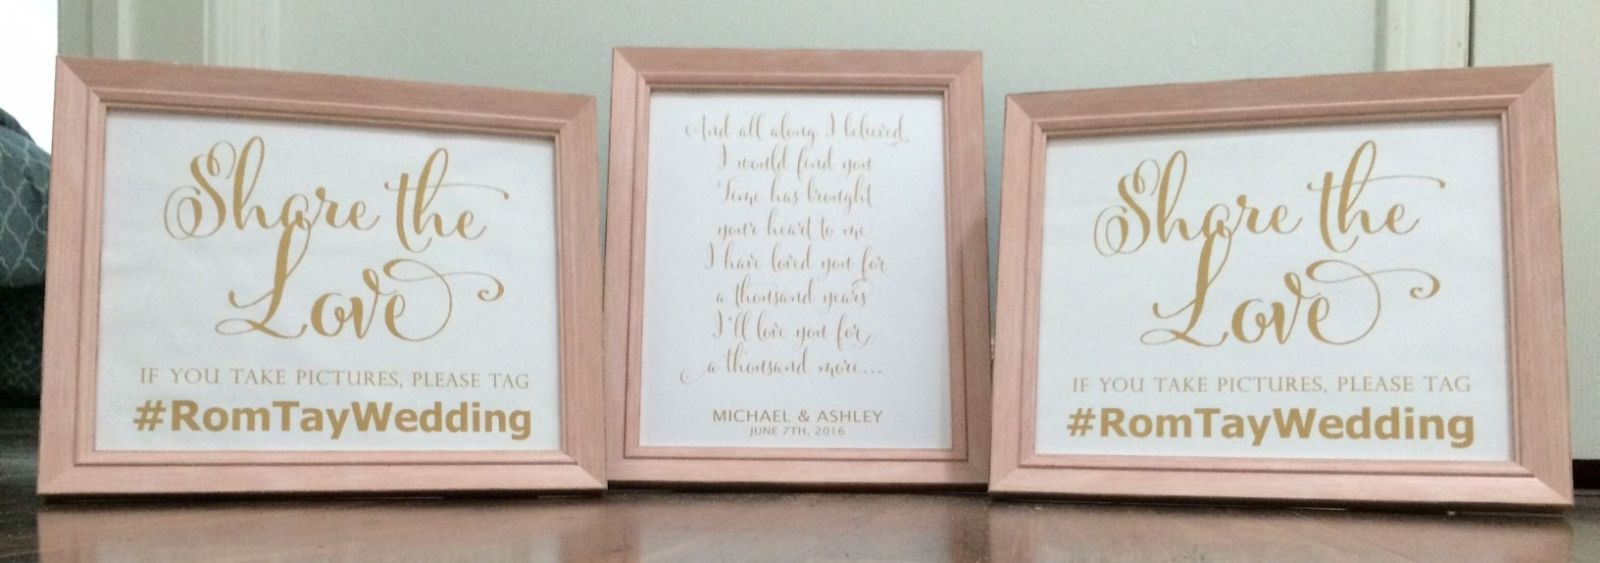 8x10 blush frames